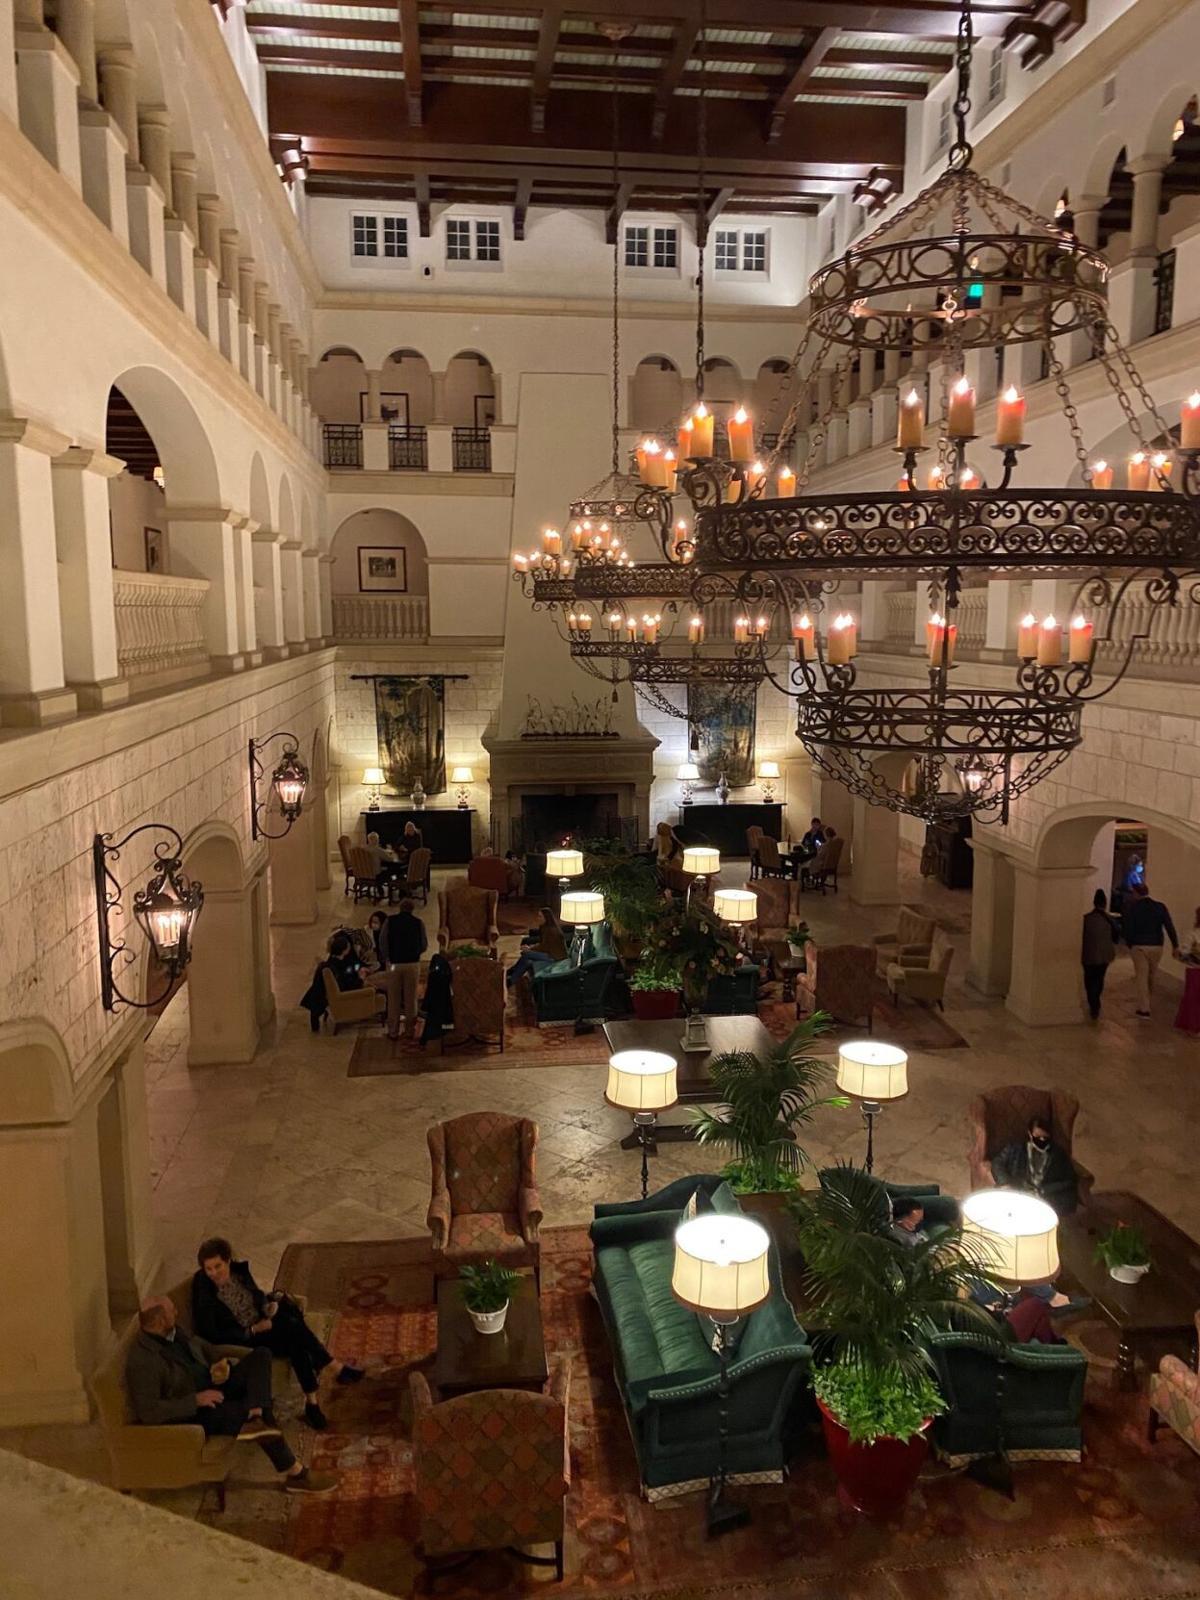 The lobby at The Cloister.